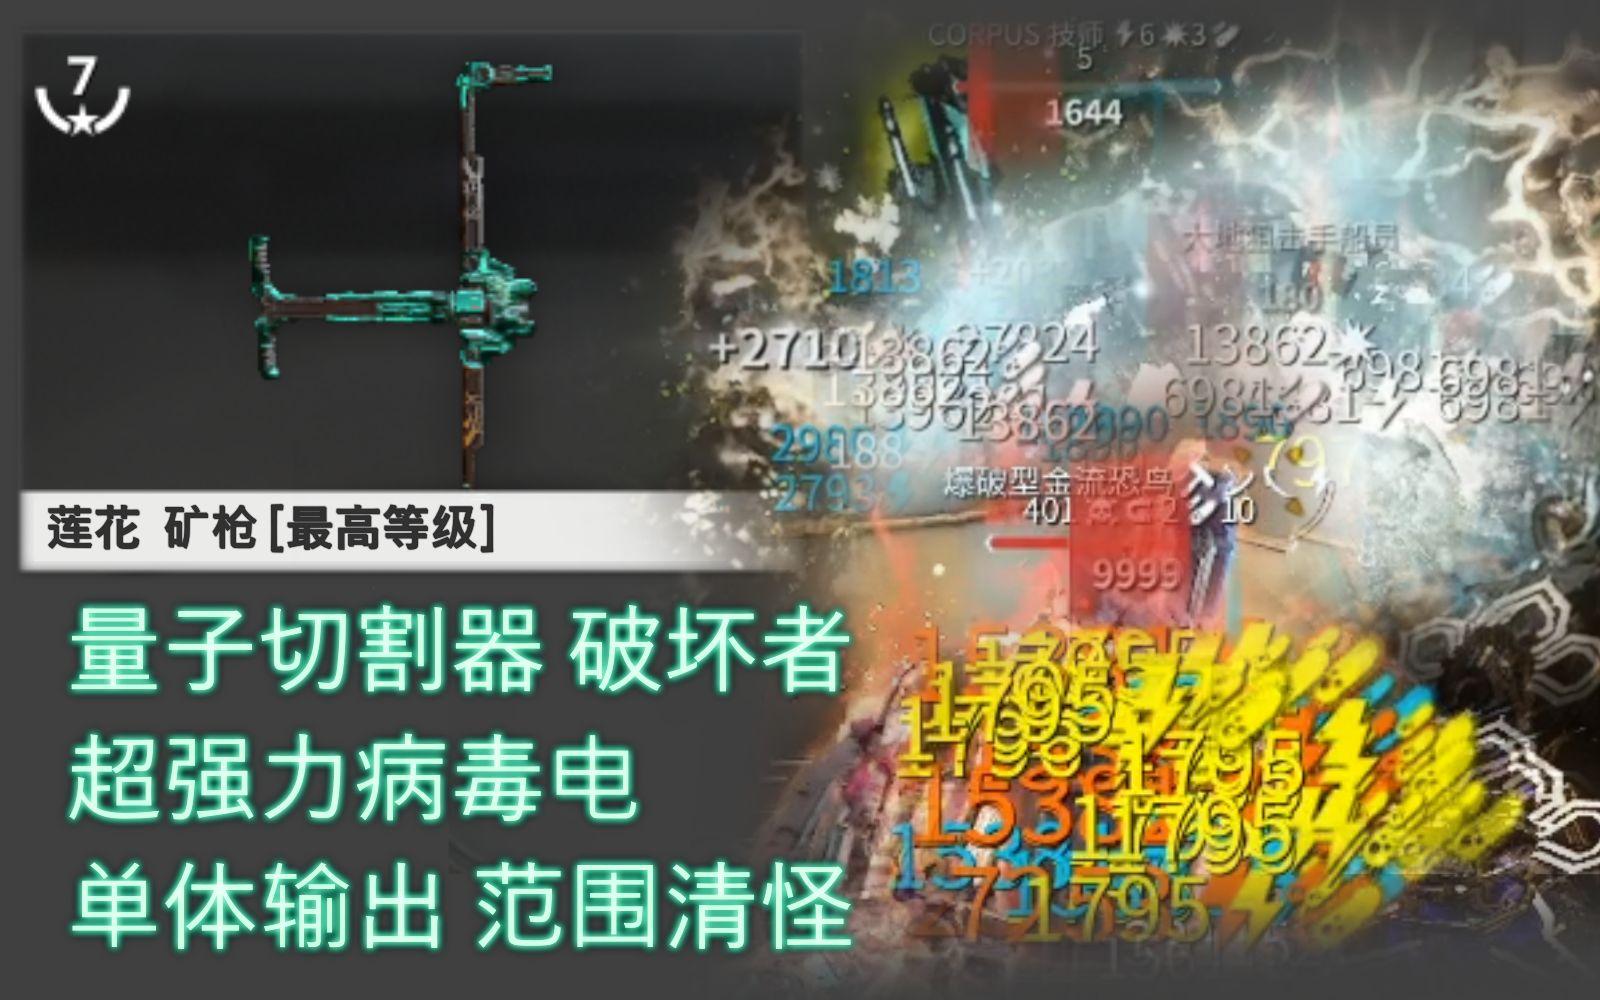 【Warframe】病毒电!行!莲花矿枪9999钢铁月球中断